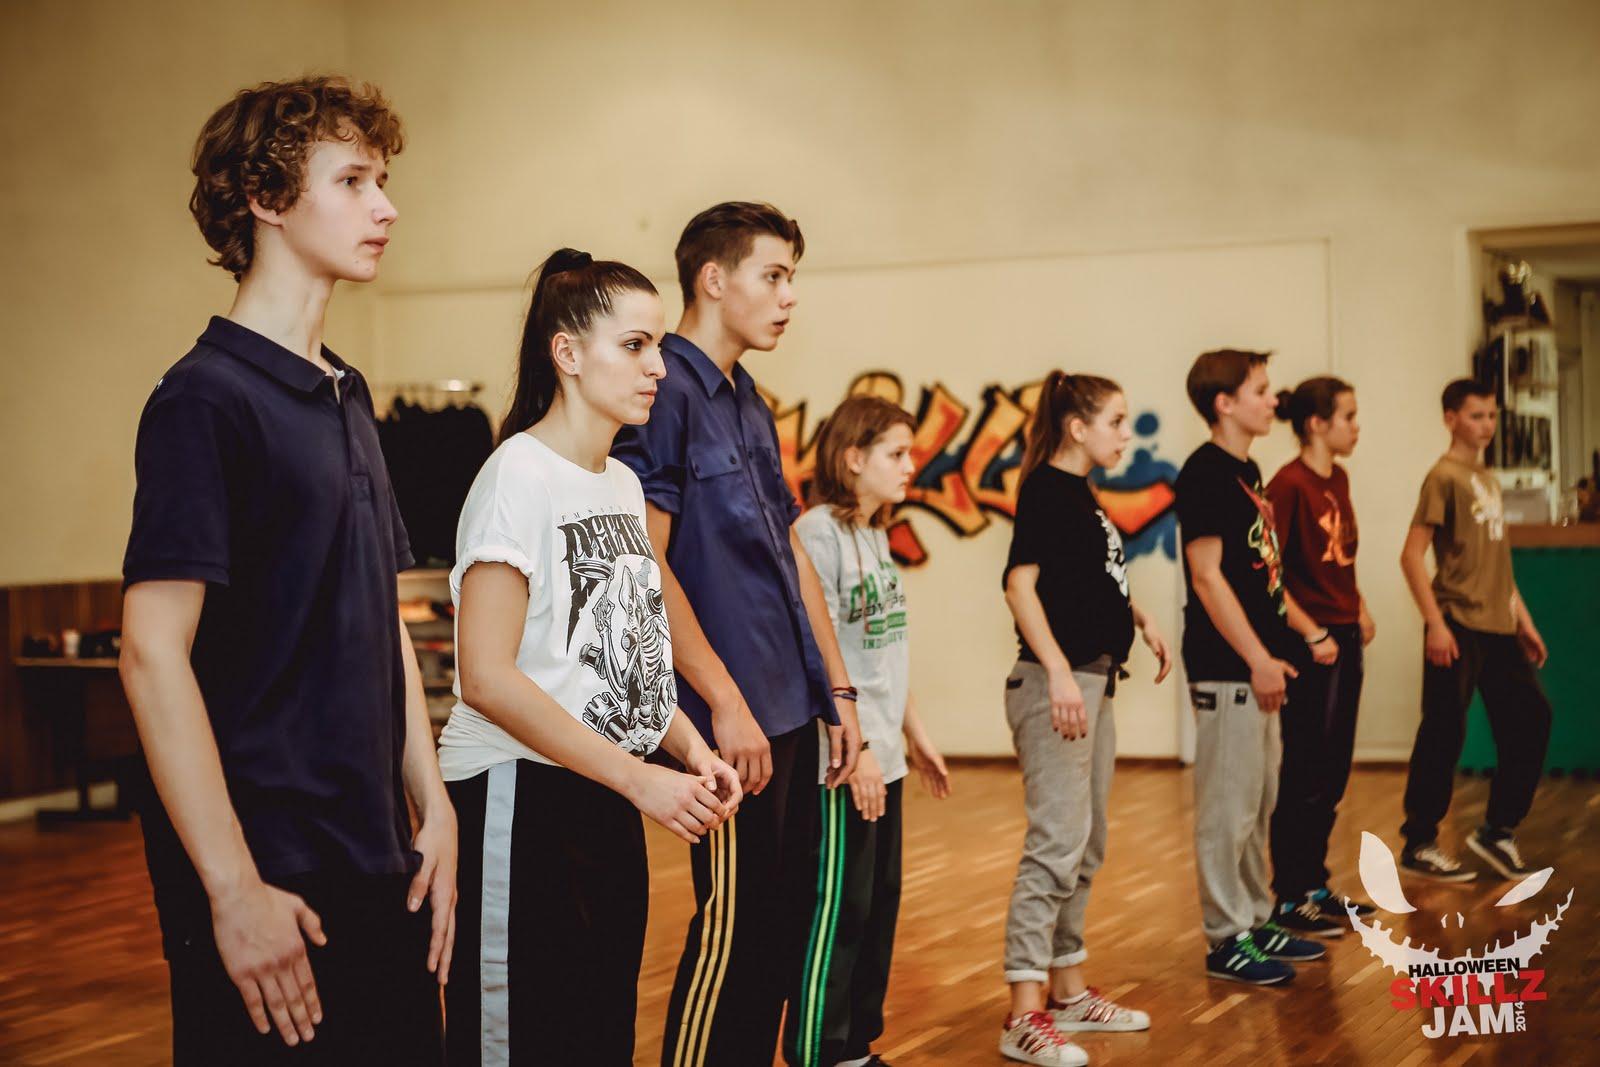 Šokių seminarai su Bouboo, Kaczorex, Tanya, Marek - _MG_7346.jpg